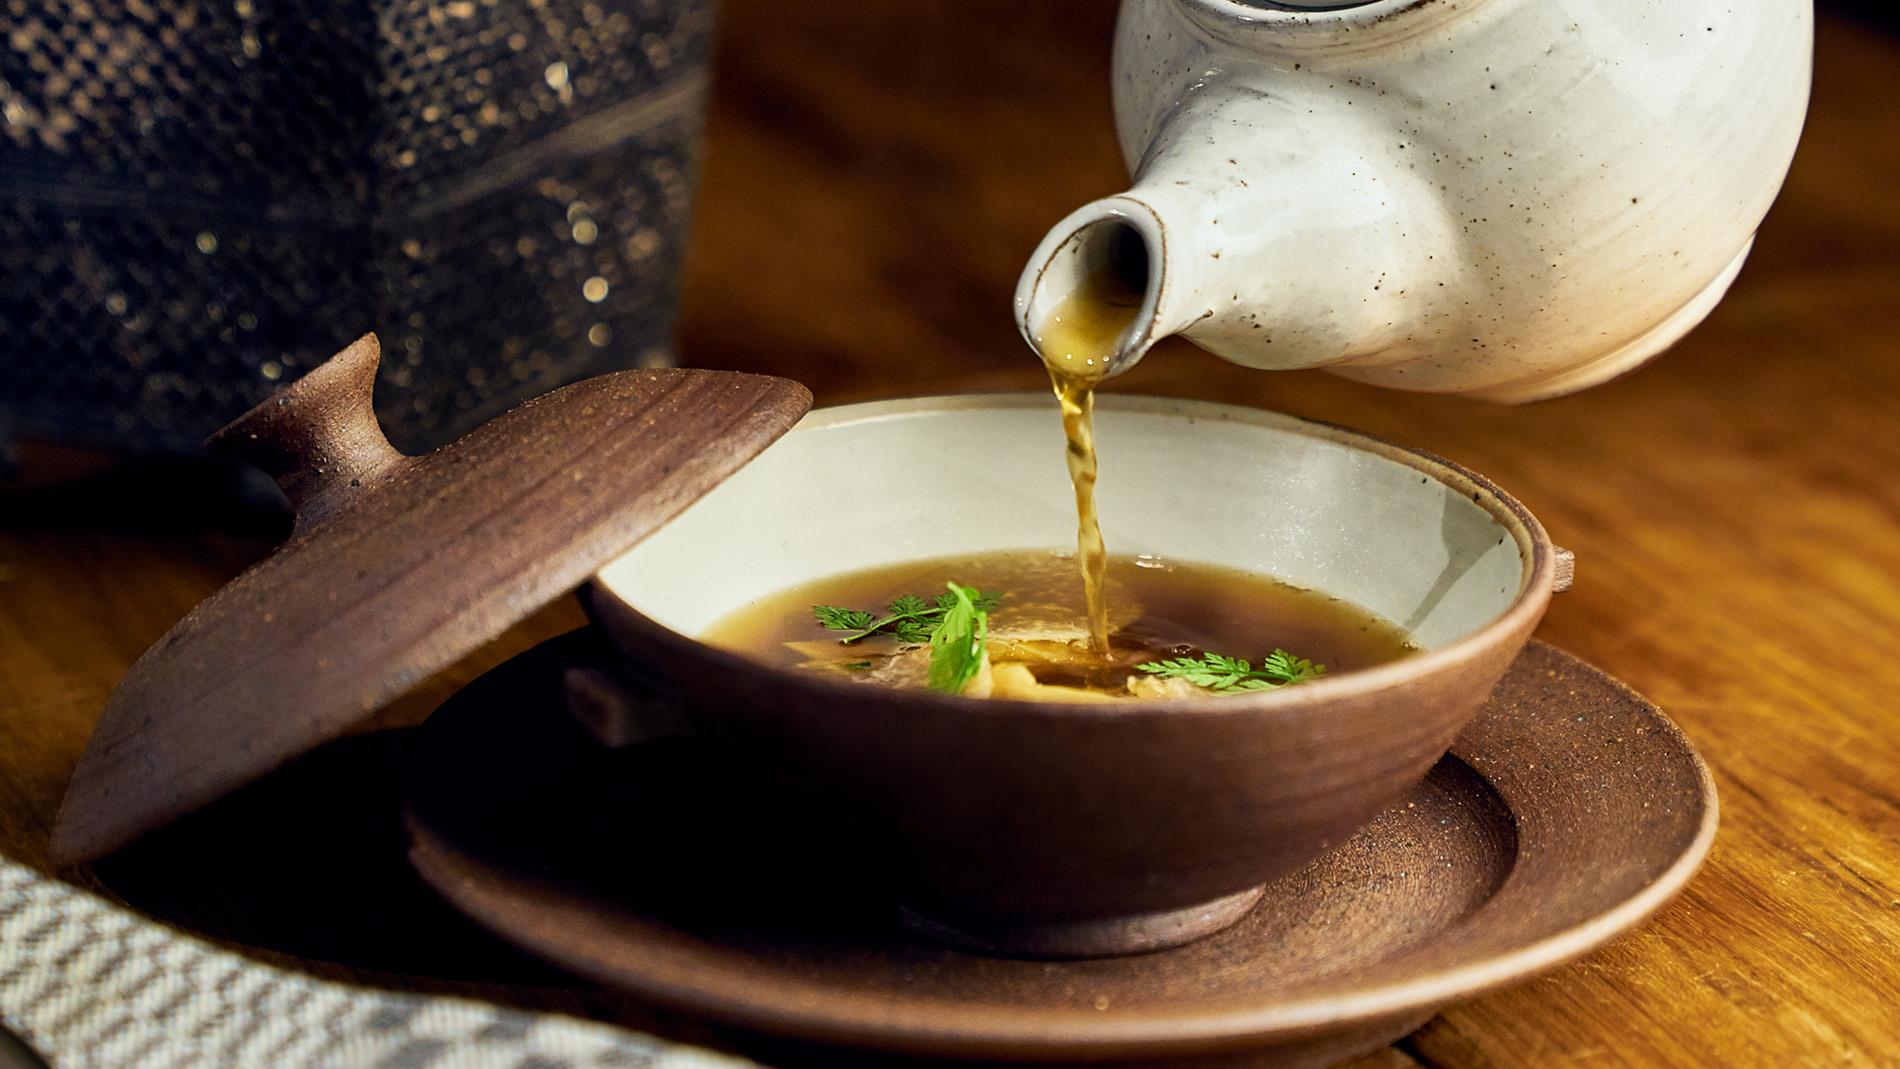 170221162147-asia-50-best-restaurants-2017-13-suhring-hungarian-duck-leg-prepared-as-maultaschen--aromatic-tea.jpg